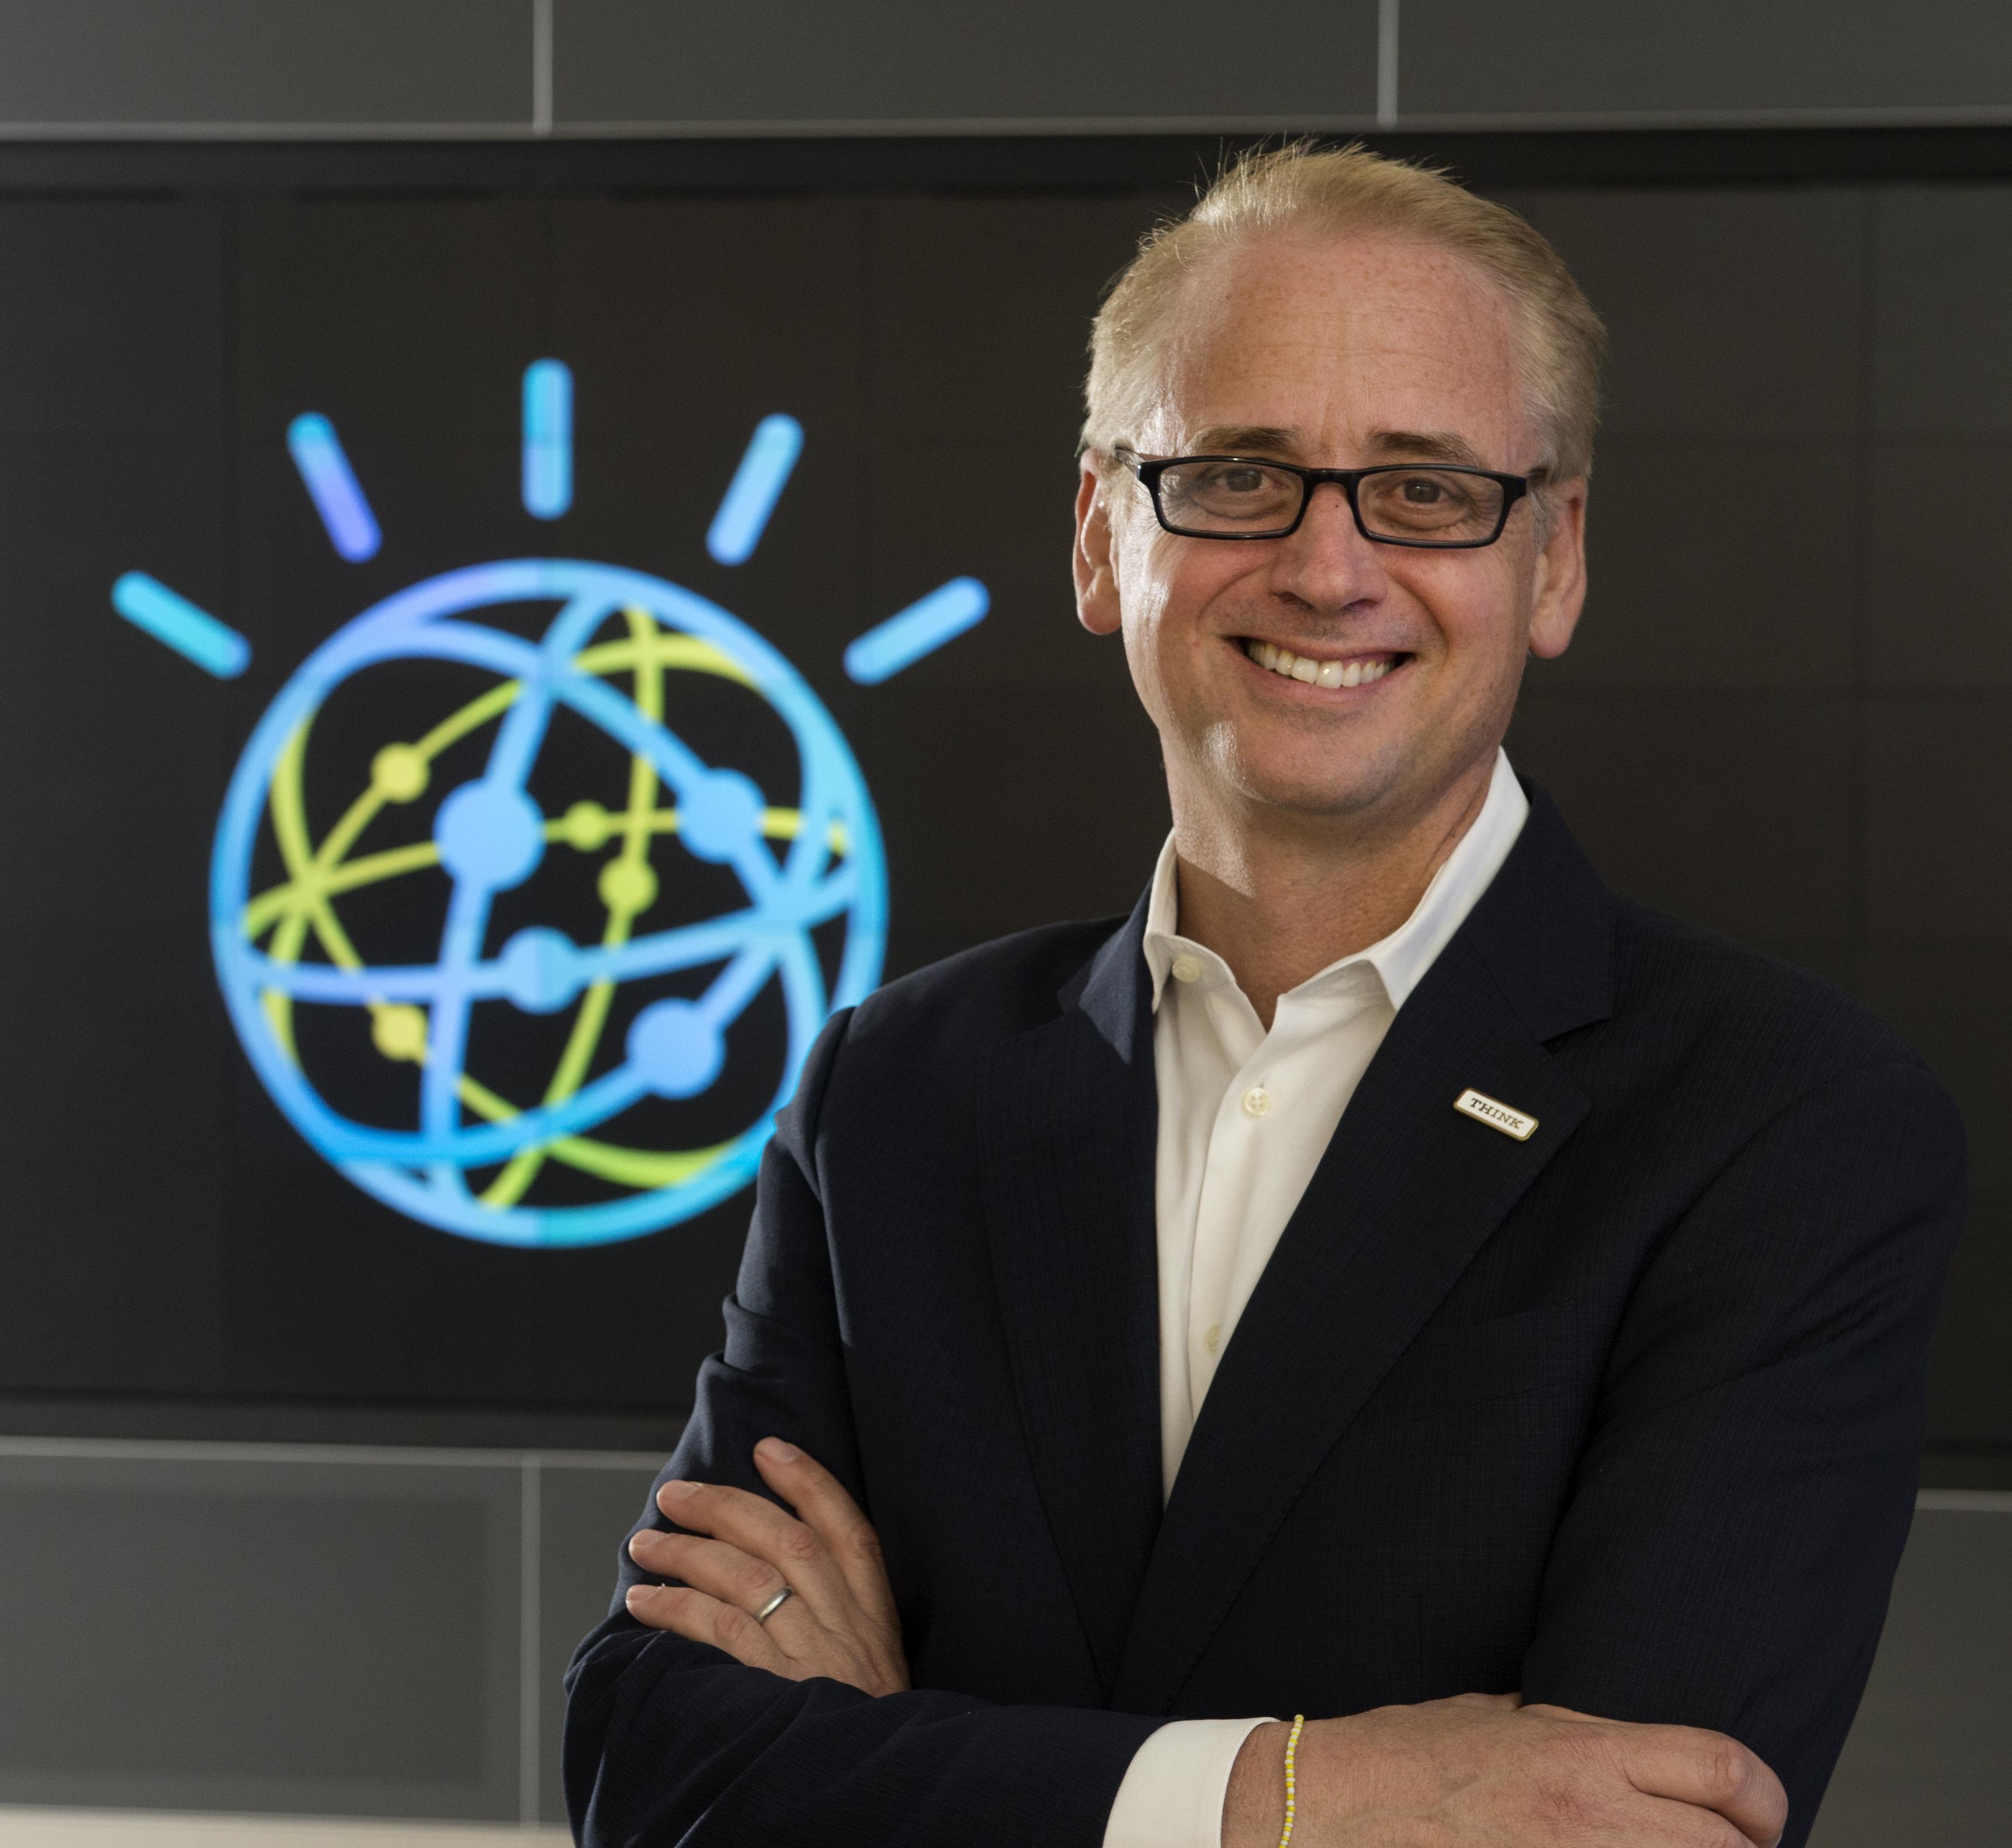 David Kenny, GM of IBM's Watson unit.